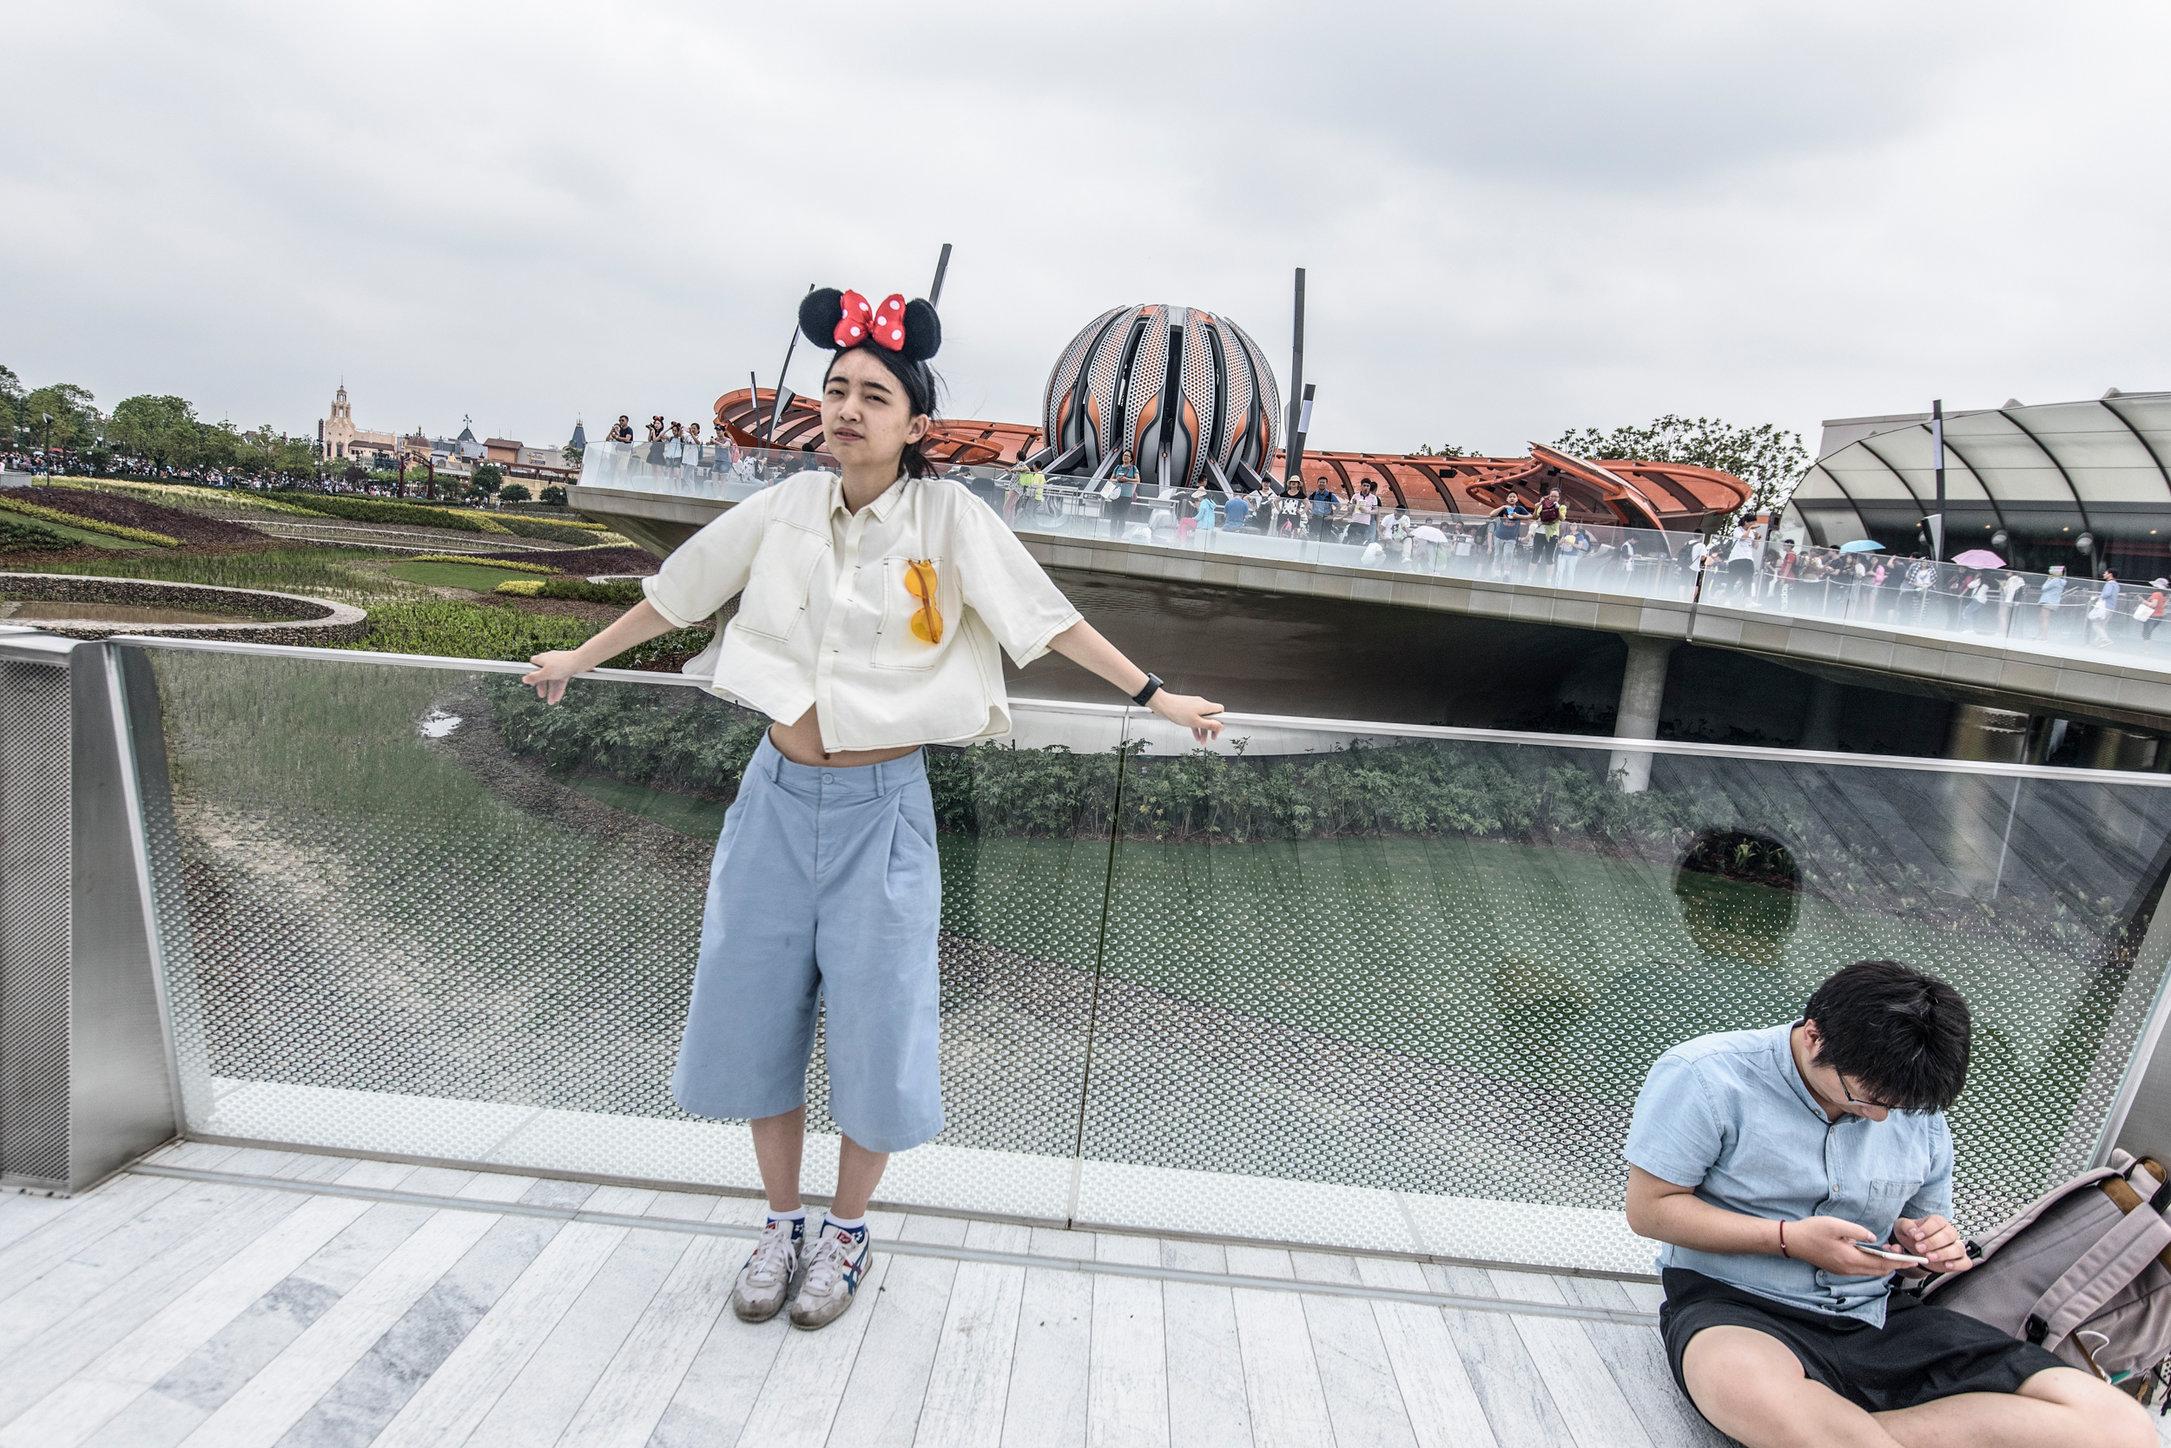 DisneylandShanghai0031.jpg